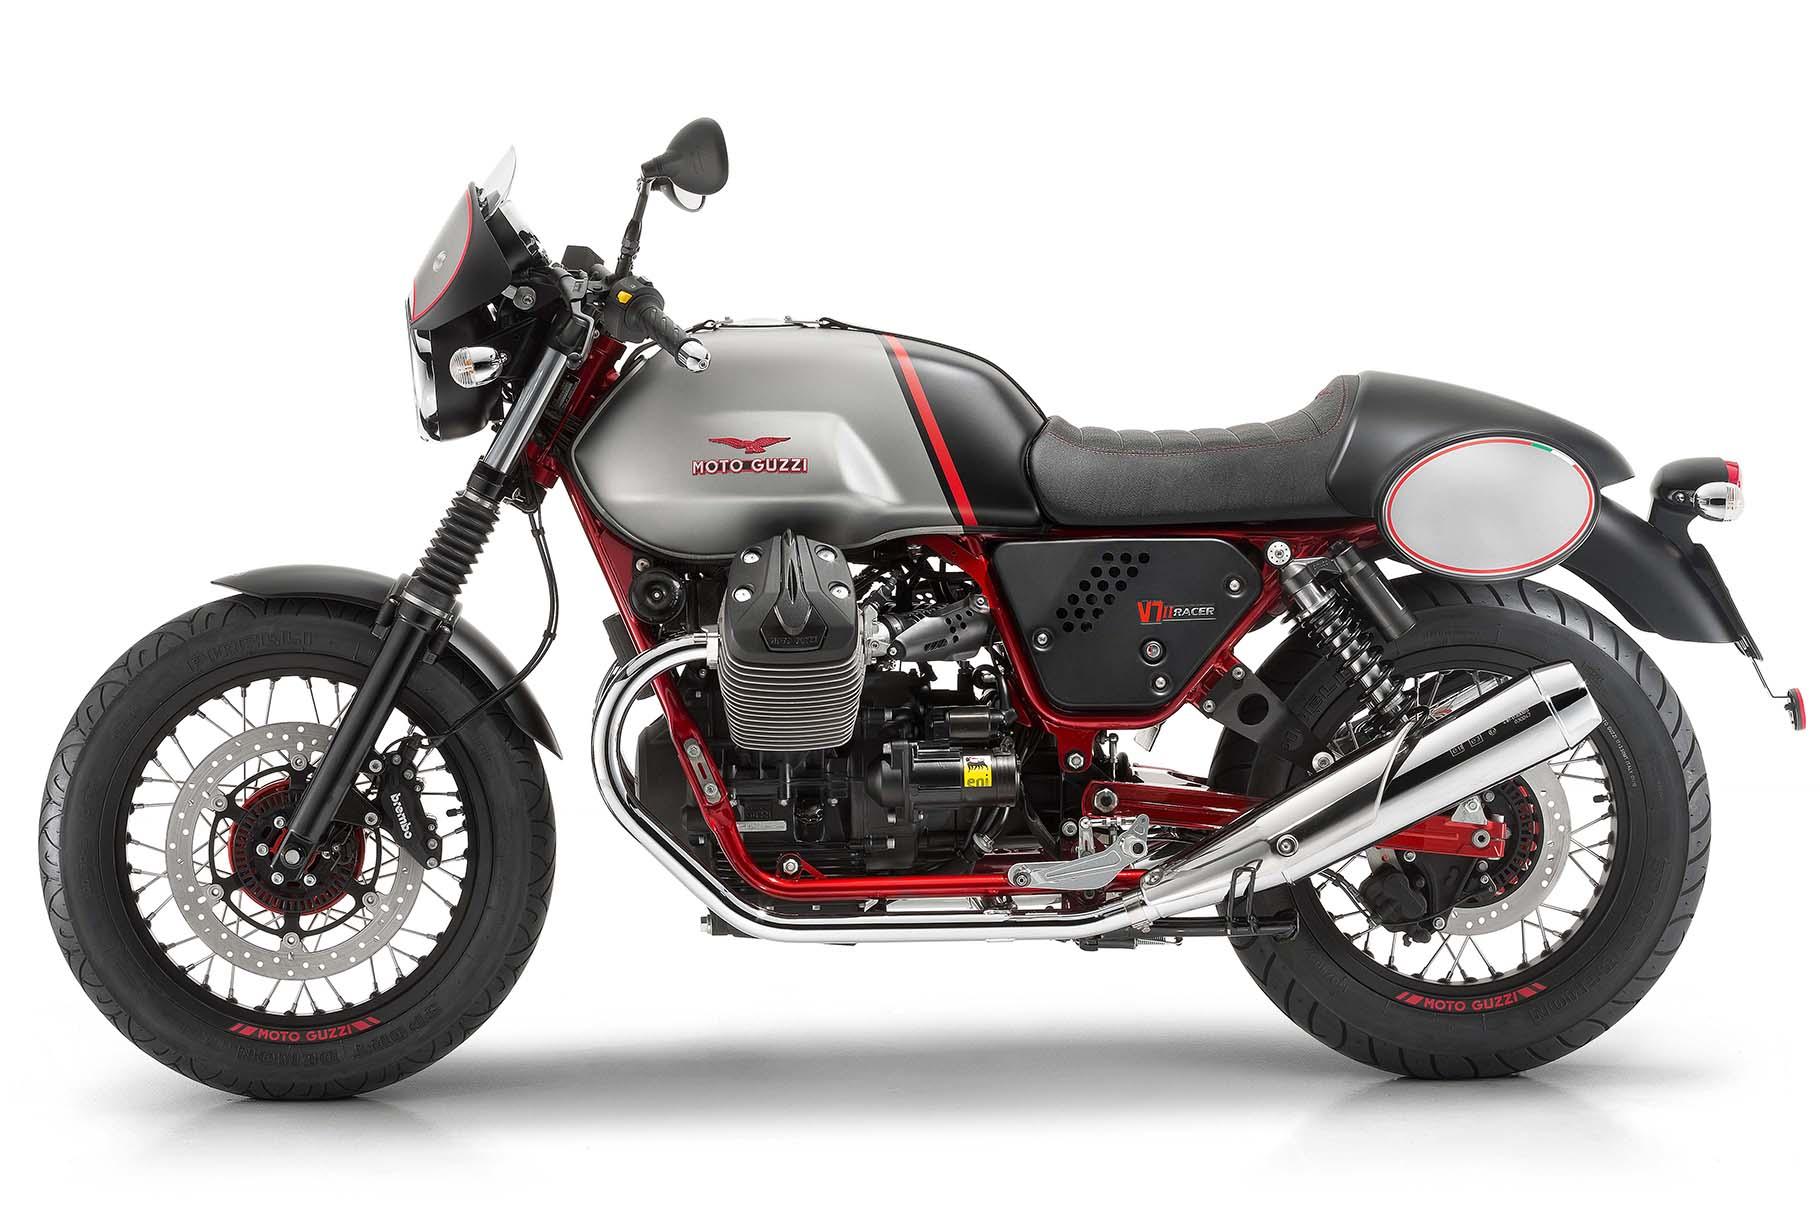 Moto Guzzi unveils four new bikes at Eicma